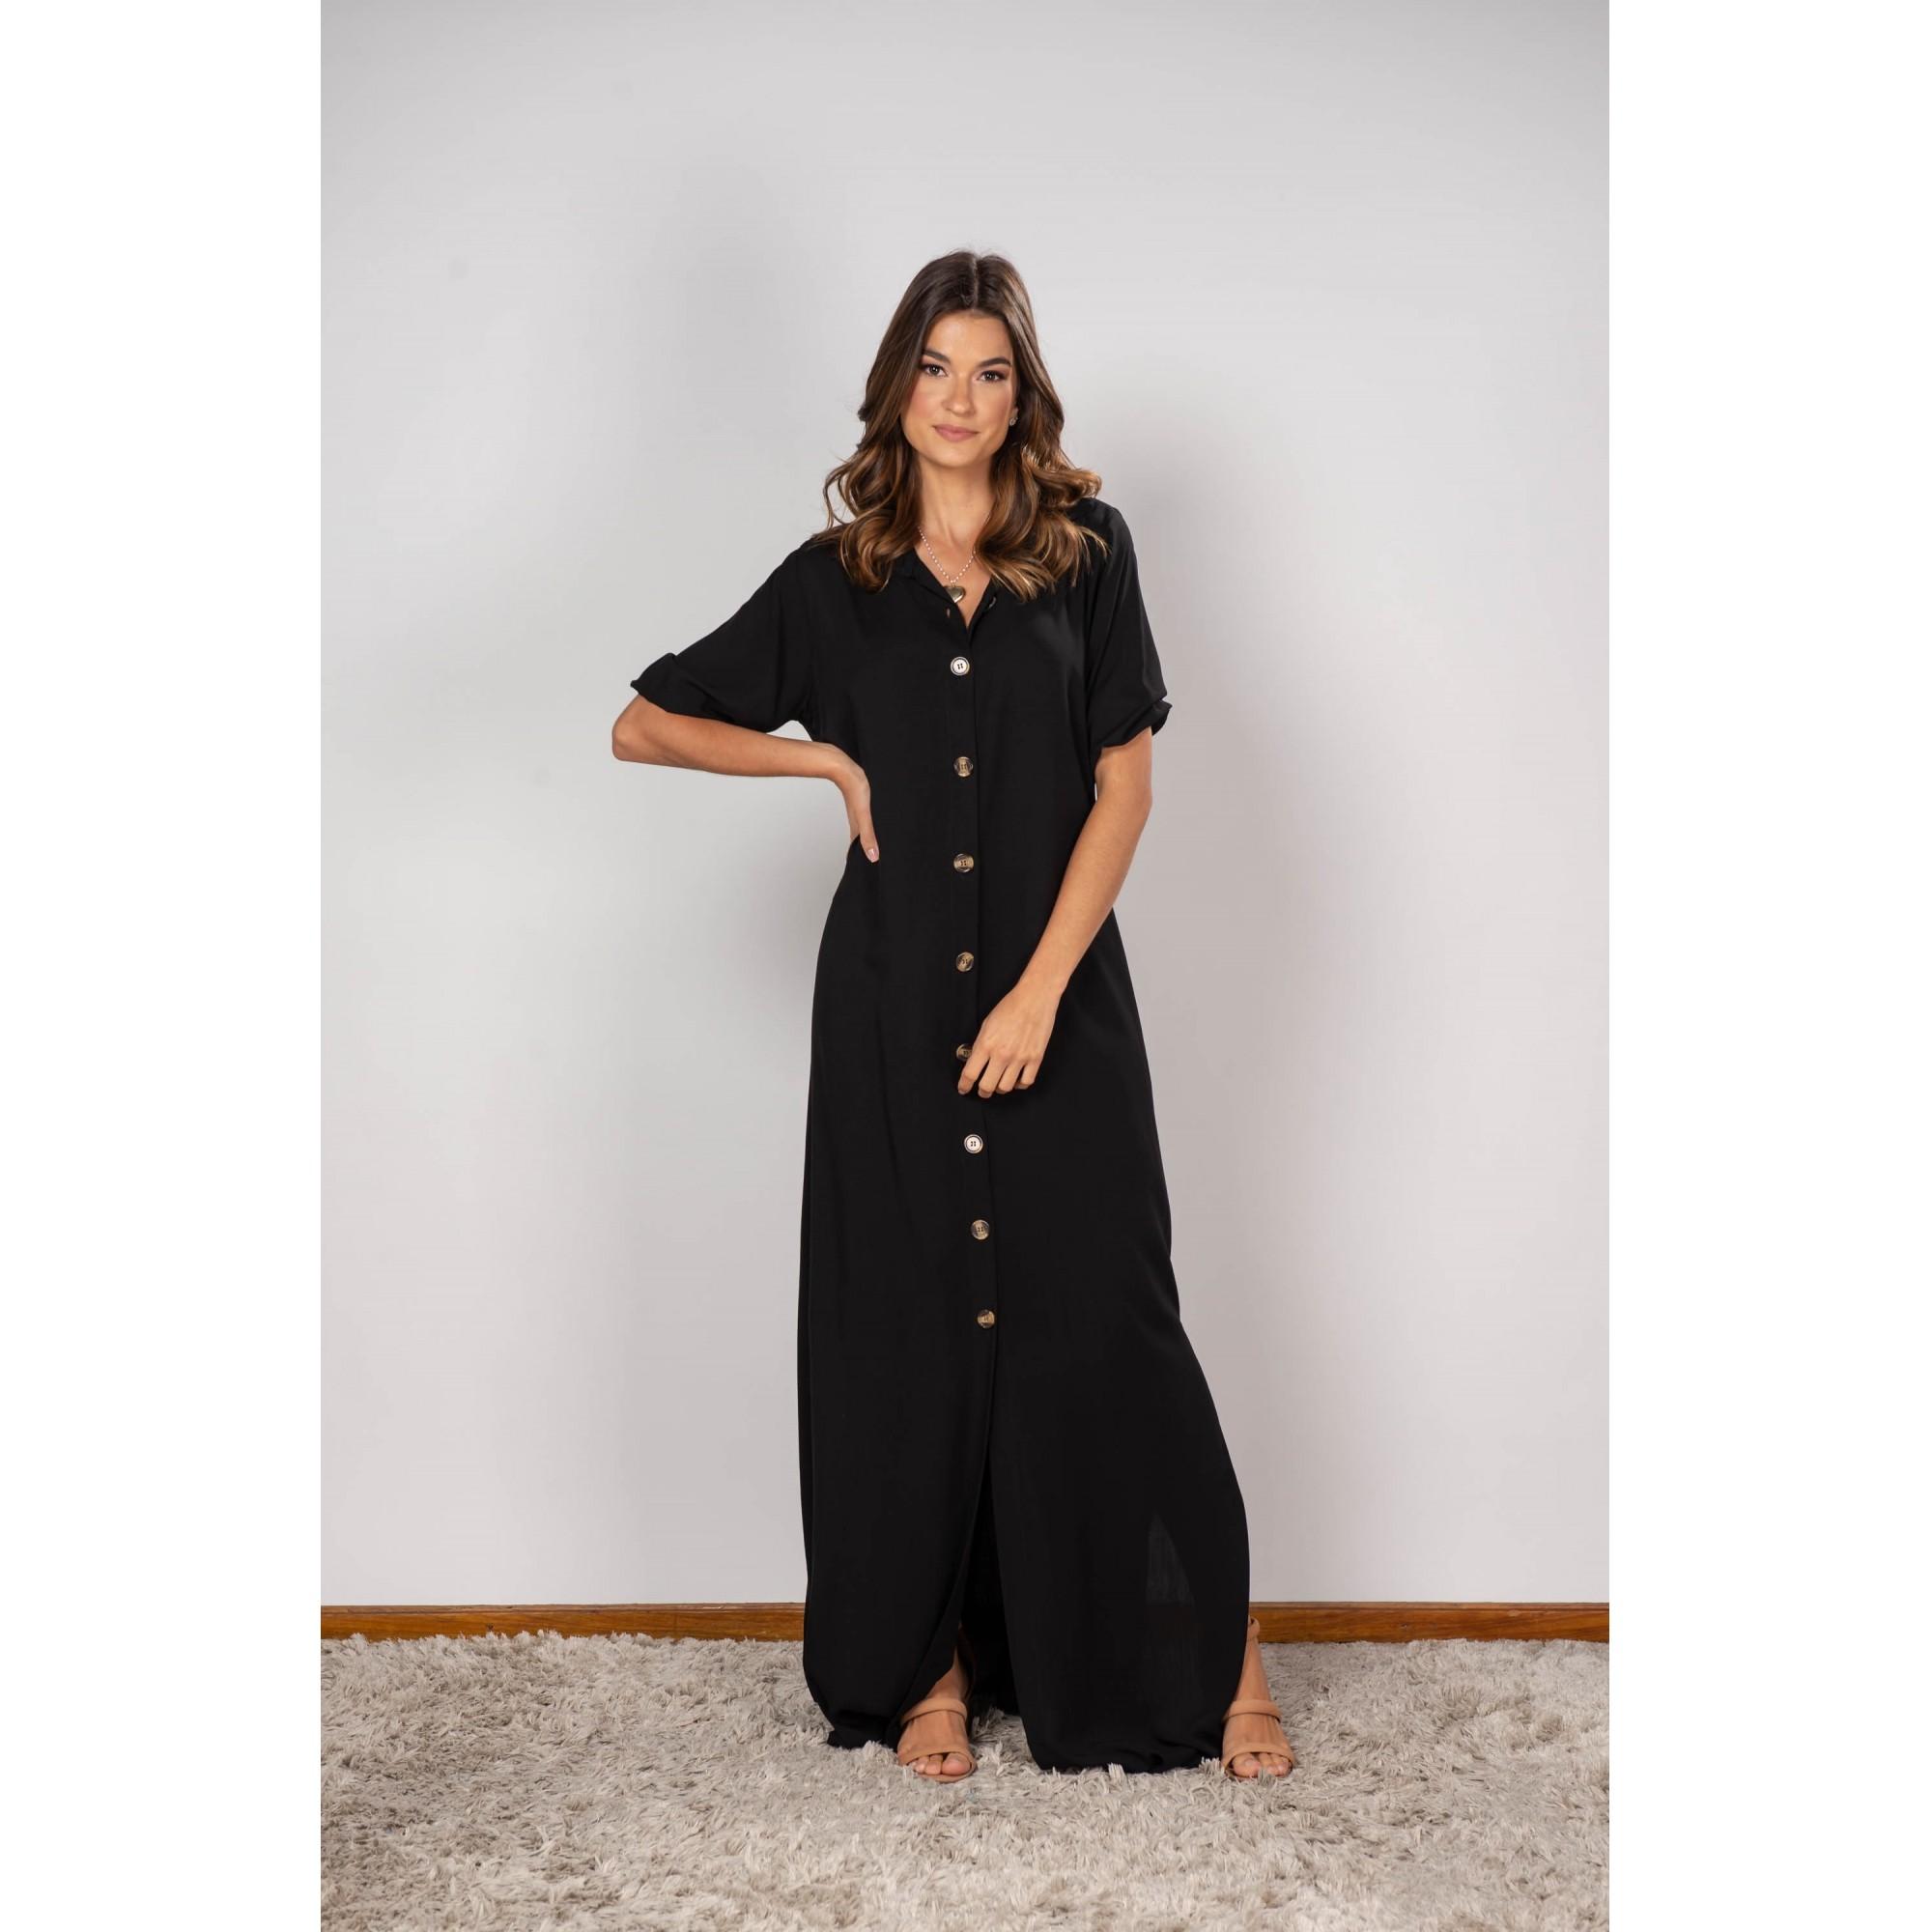 Vestido Isabela Preto